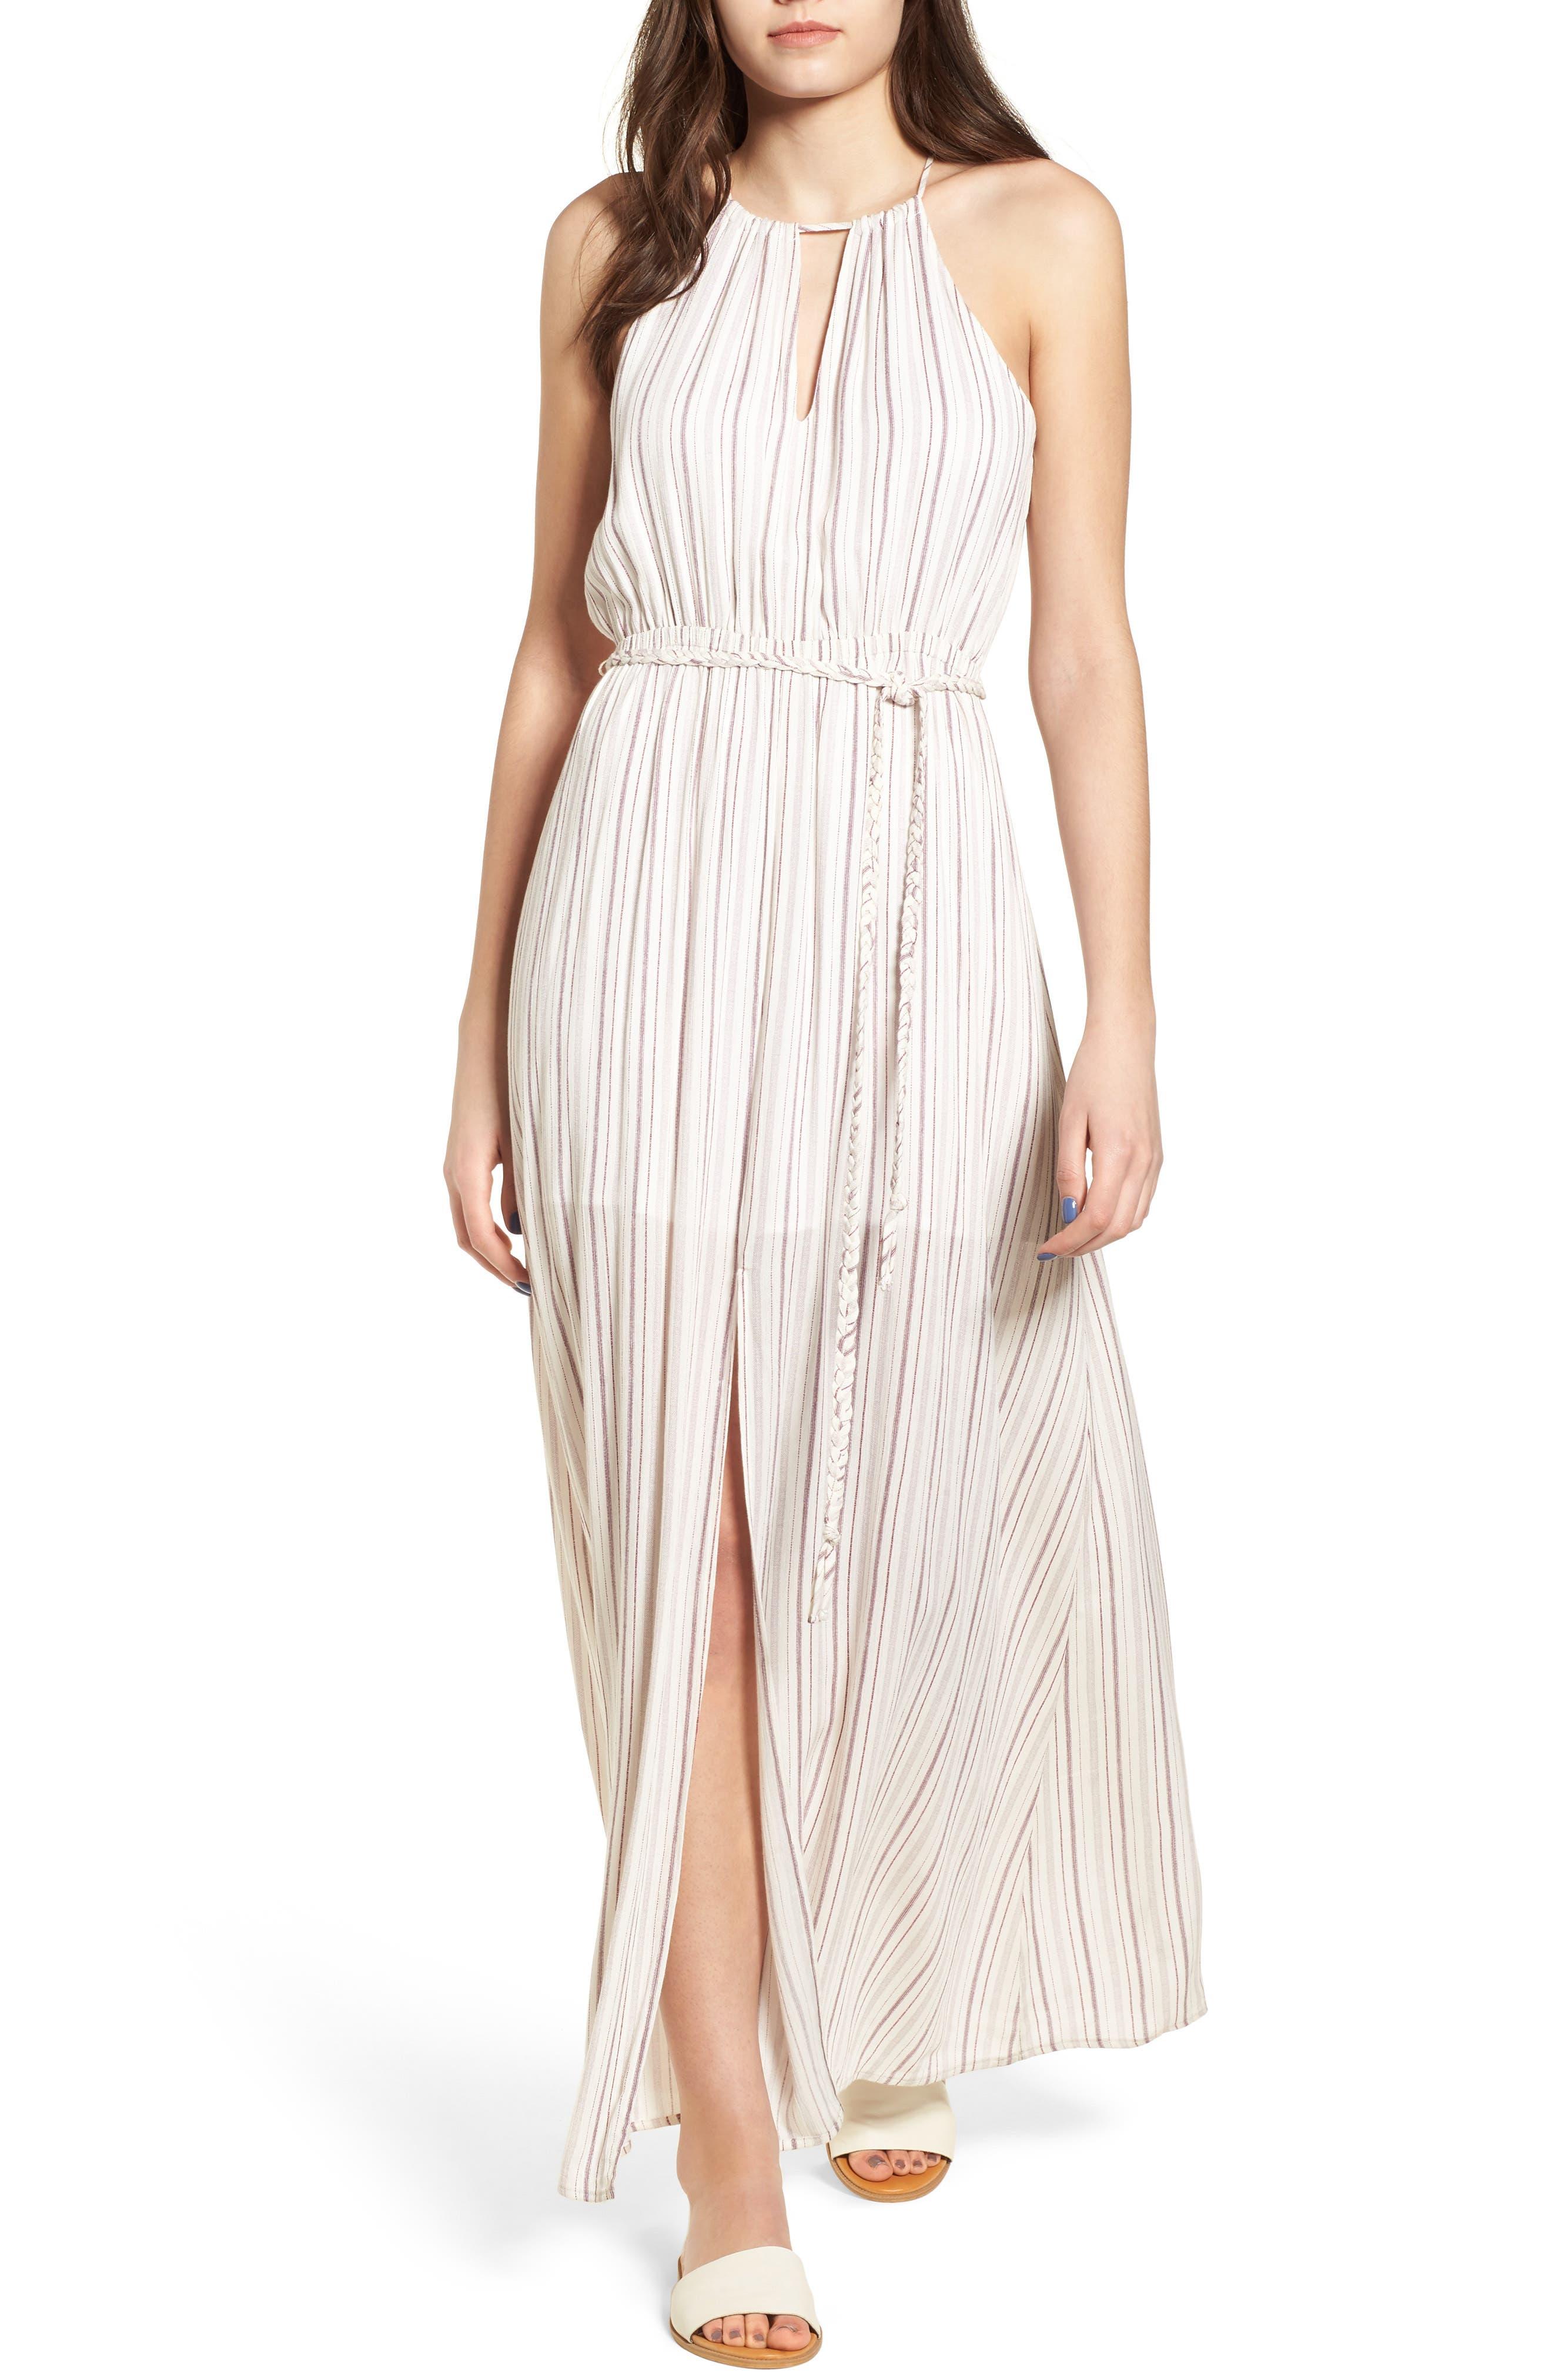 Daydreamer Stripe Maxi Dress,                         Main,                         color, Ivory/ Mauve